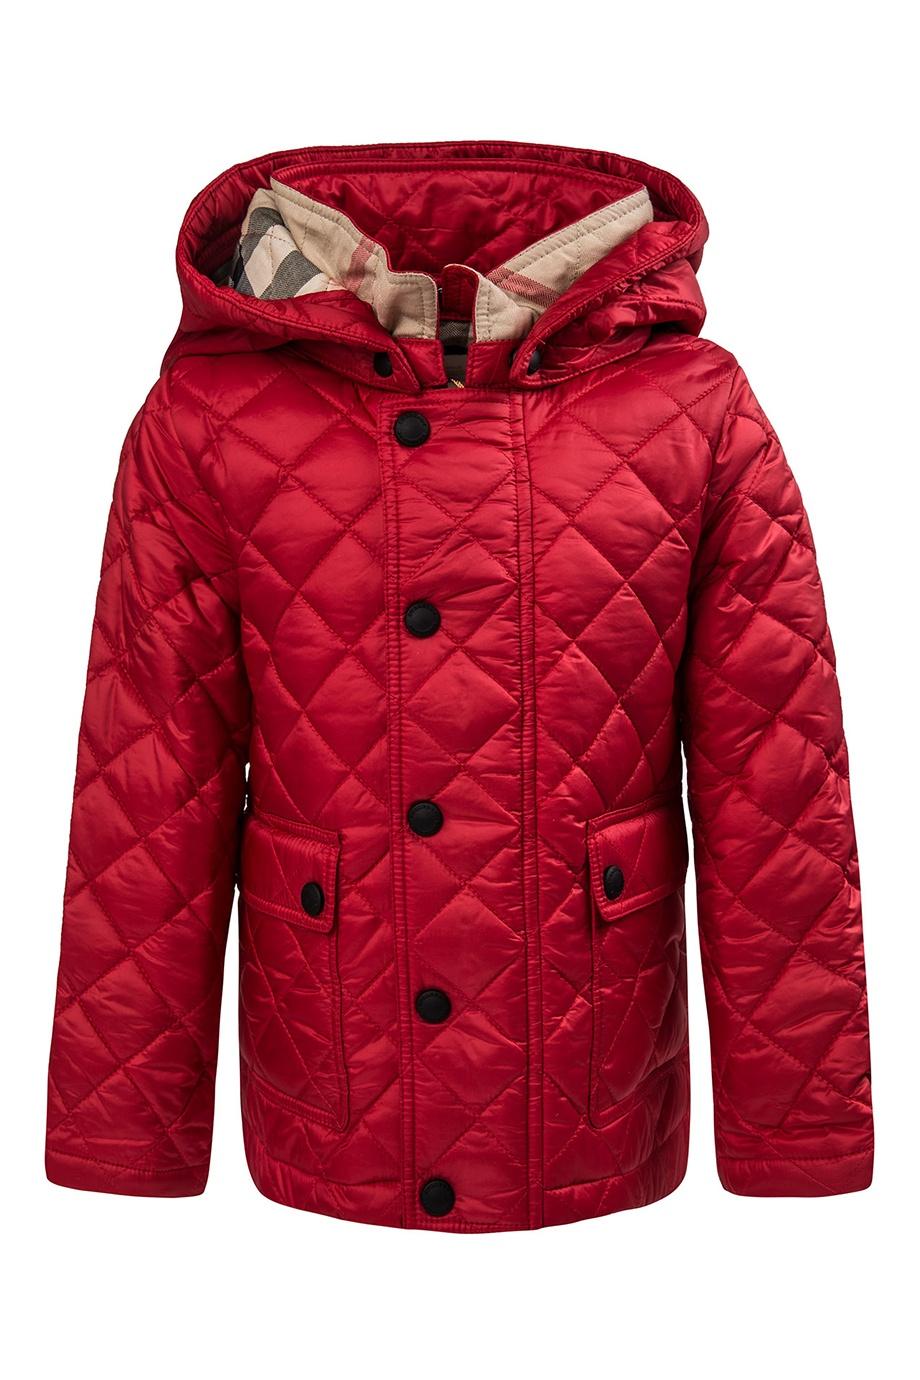 Стеганая куртка Burberry Kids - Яркая стеганая куртка из детской ... 7f1fe70efbd